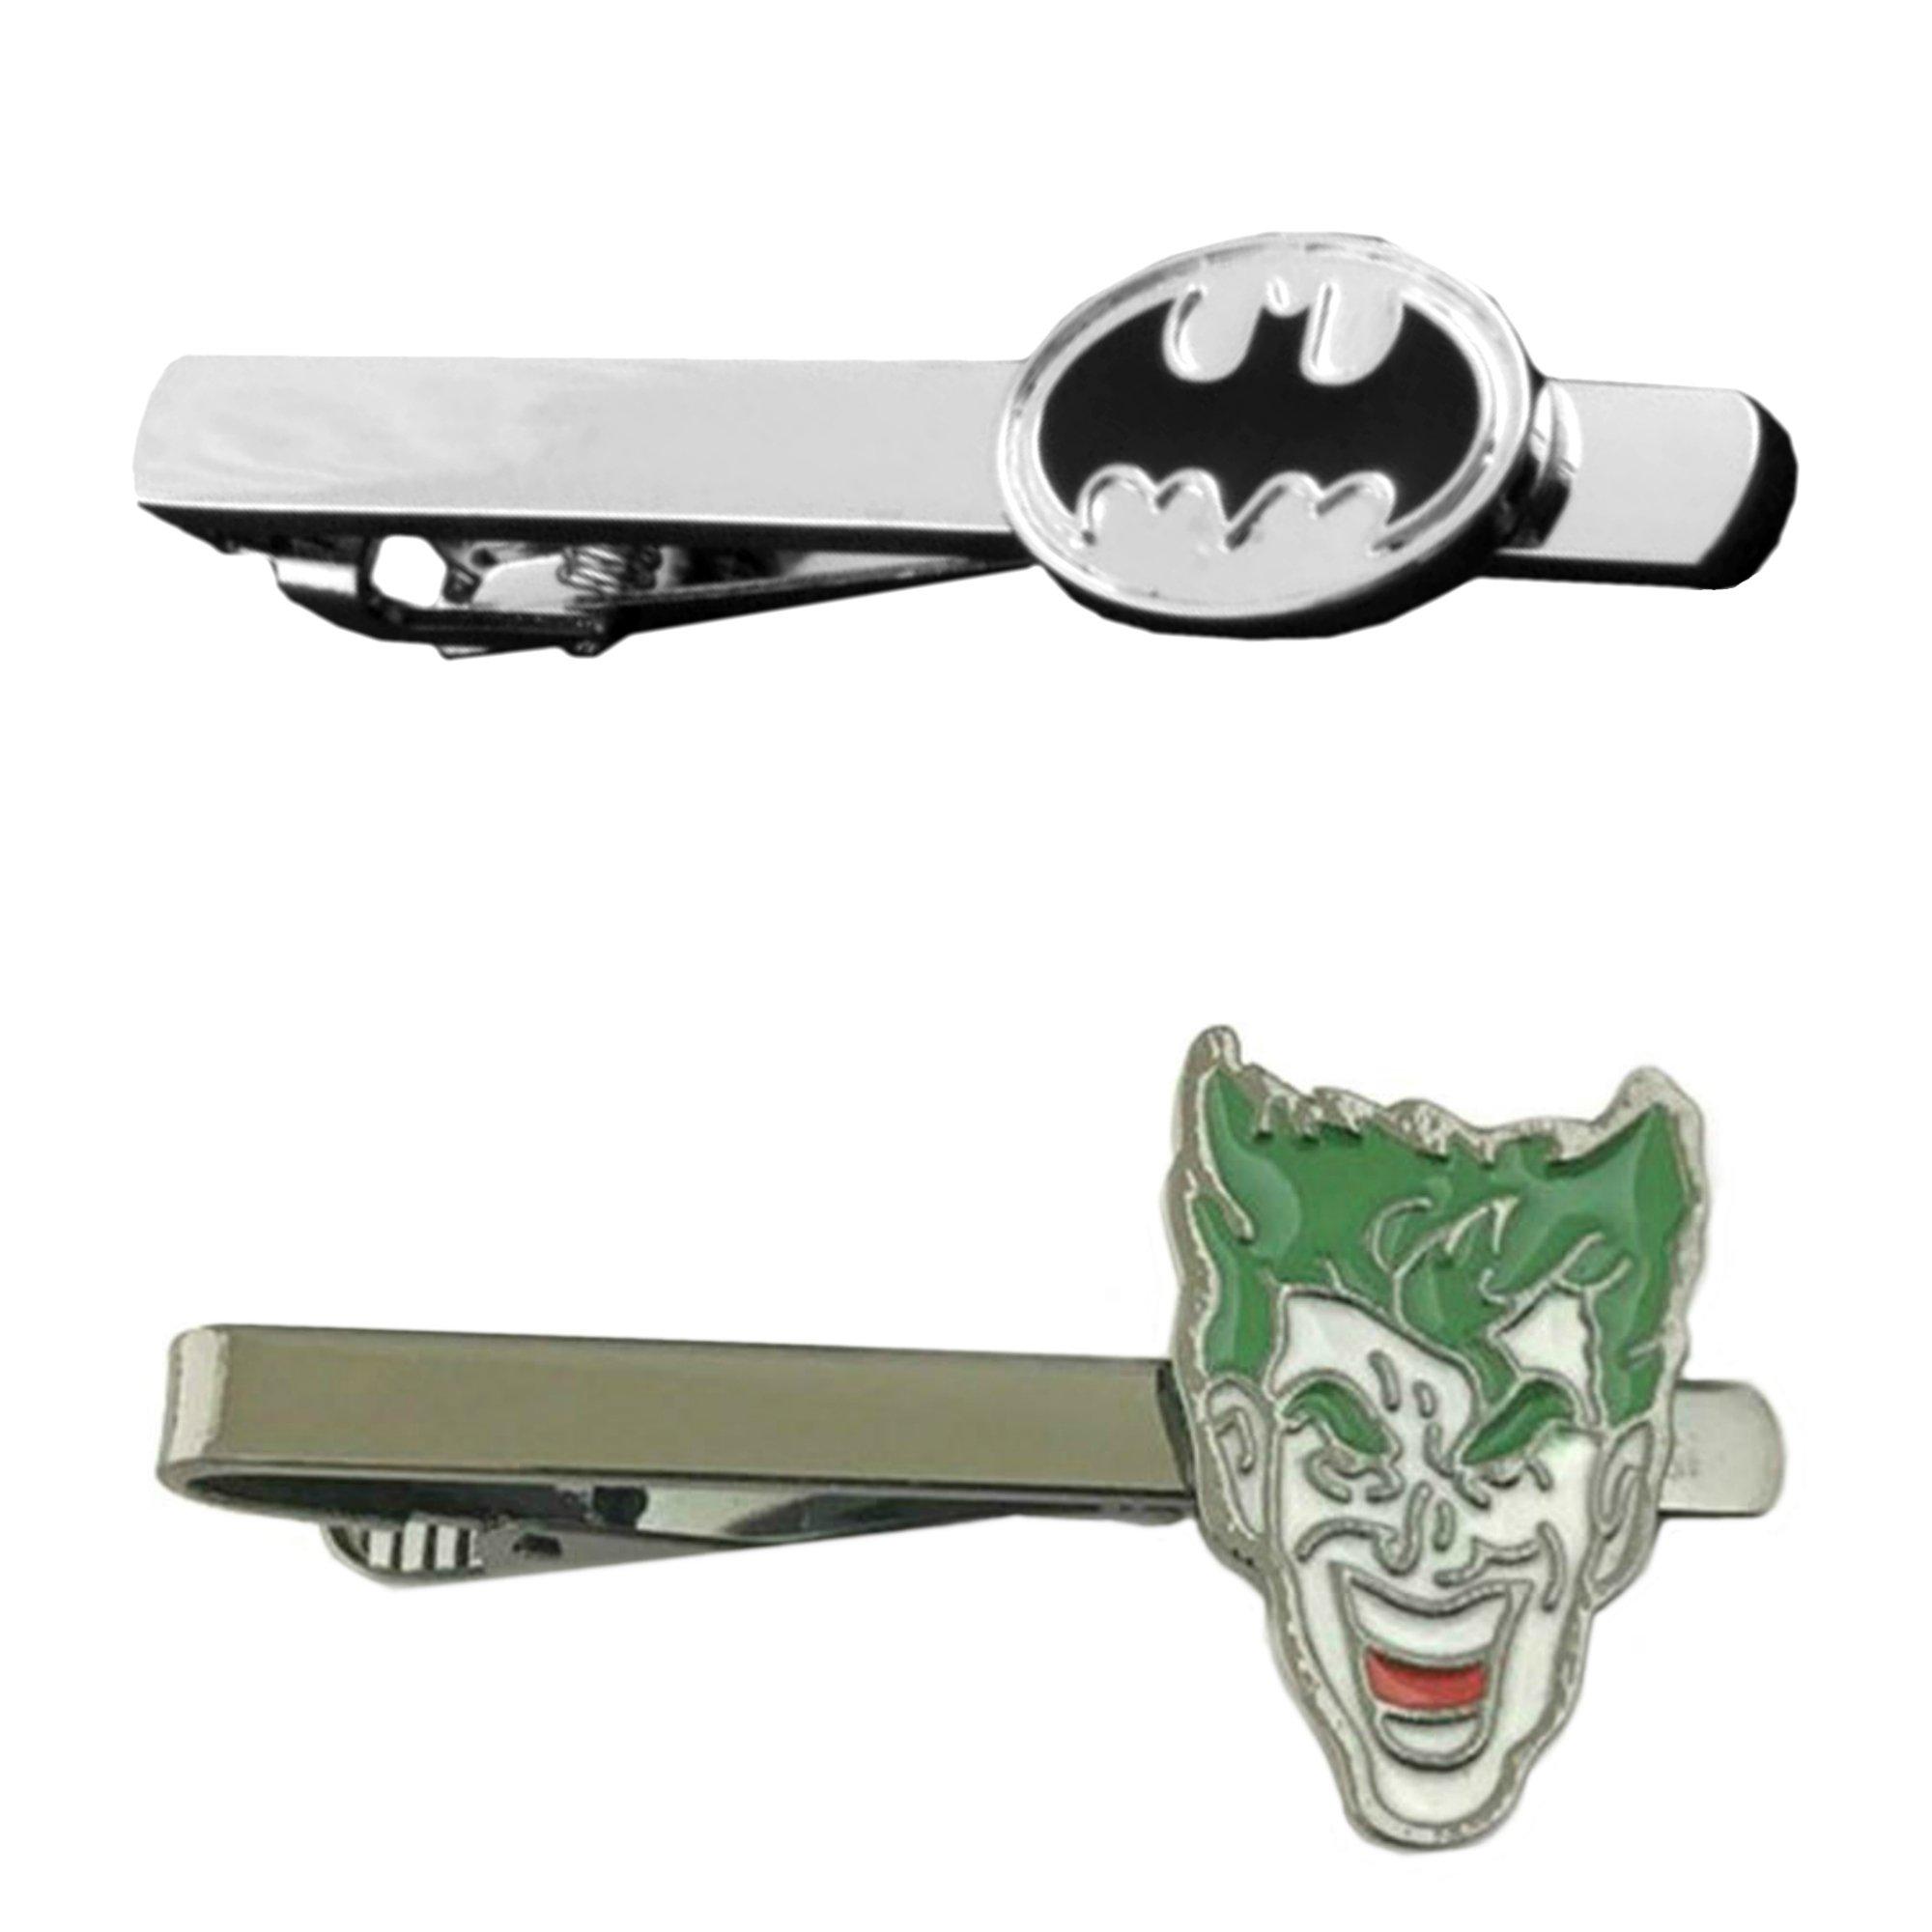 DC Comics - Batman & Joker - Tiebar Tie Clasp Set of 2 Wedding Superhero Logo w/Gift Box